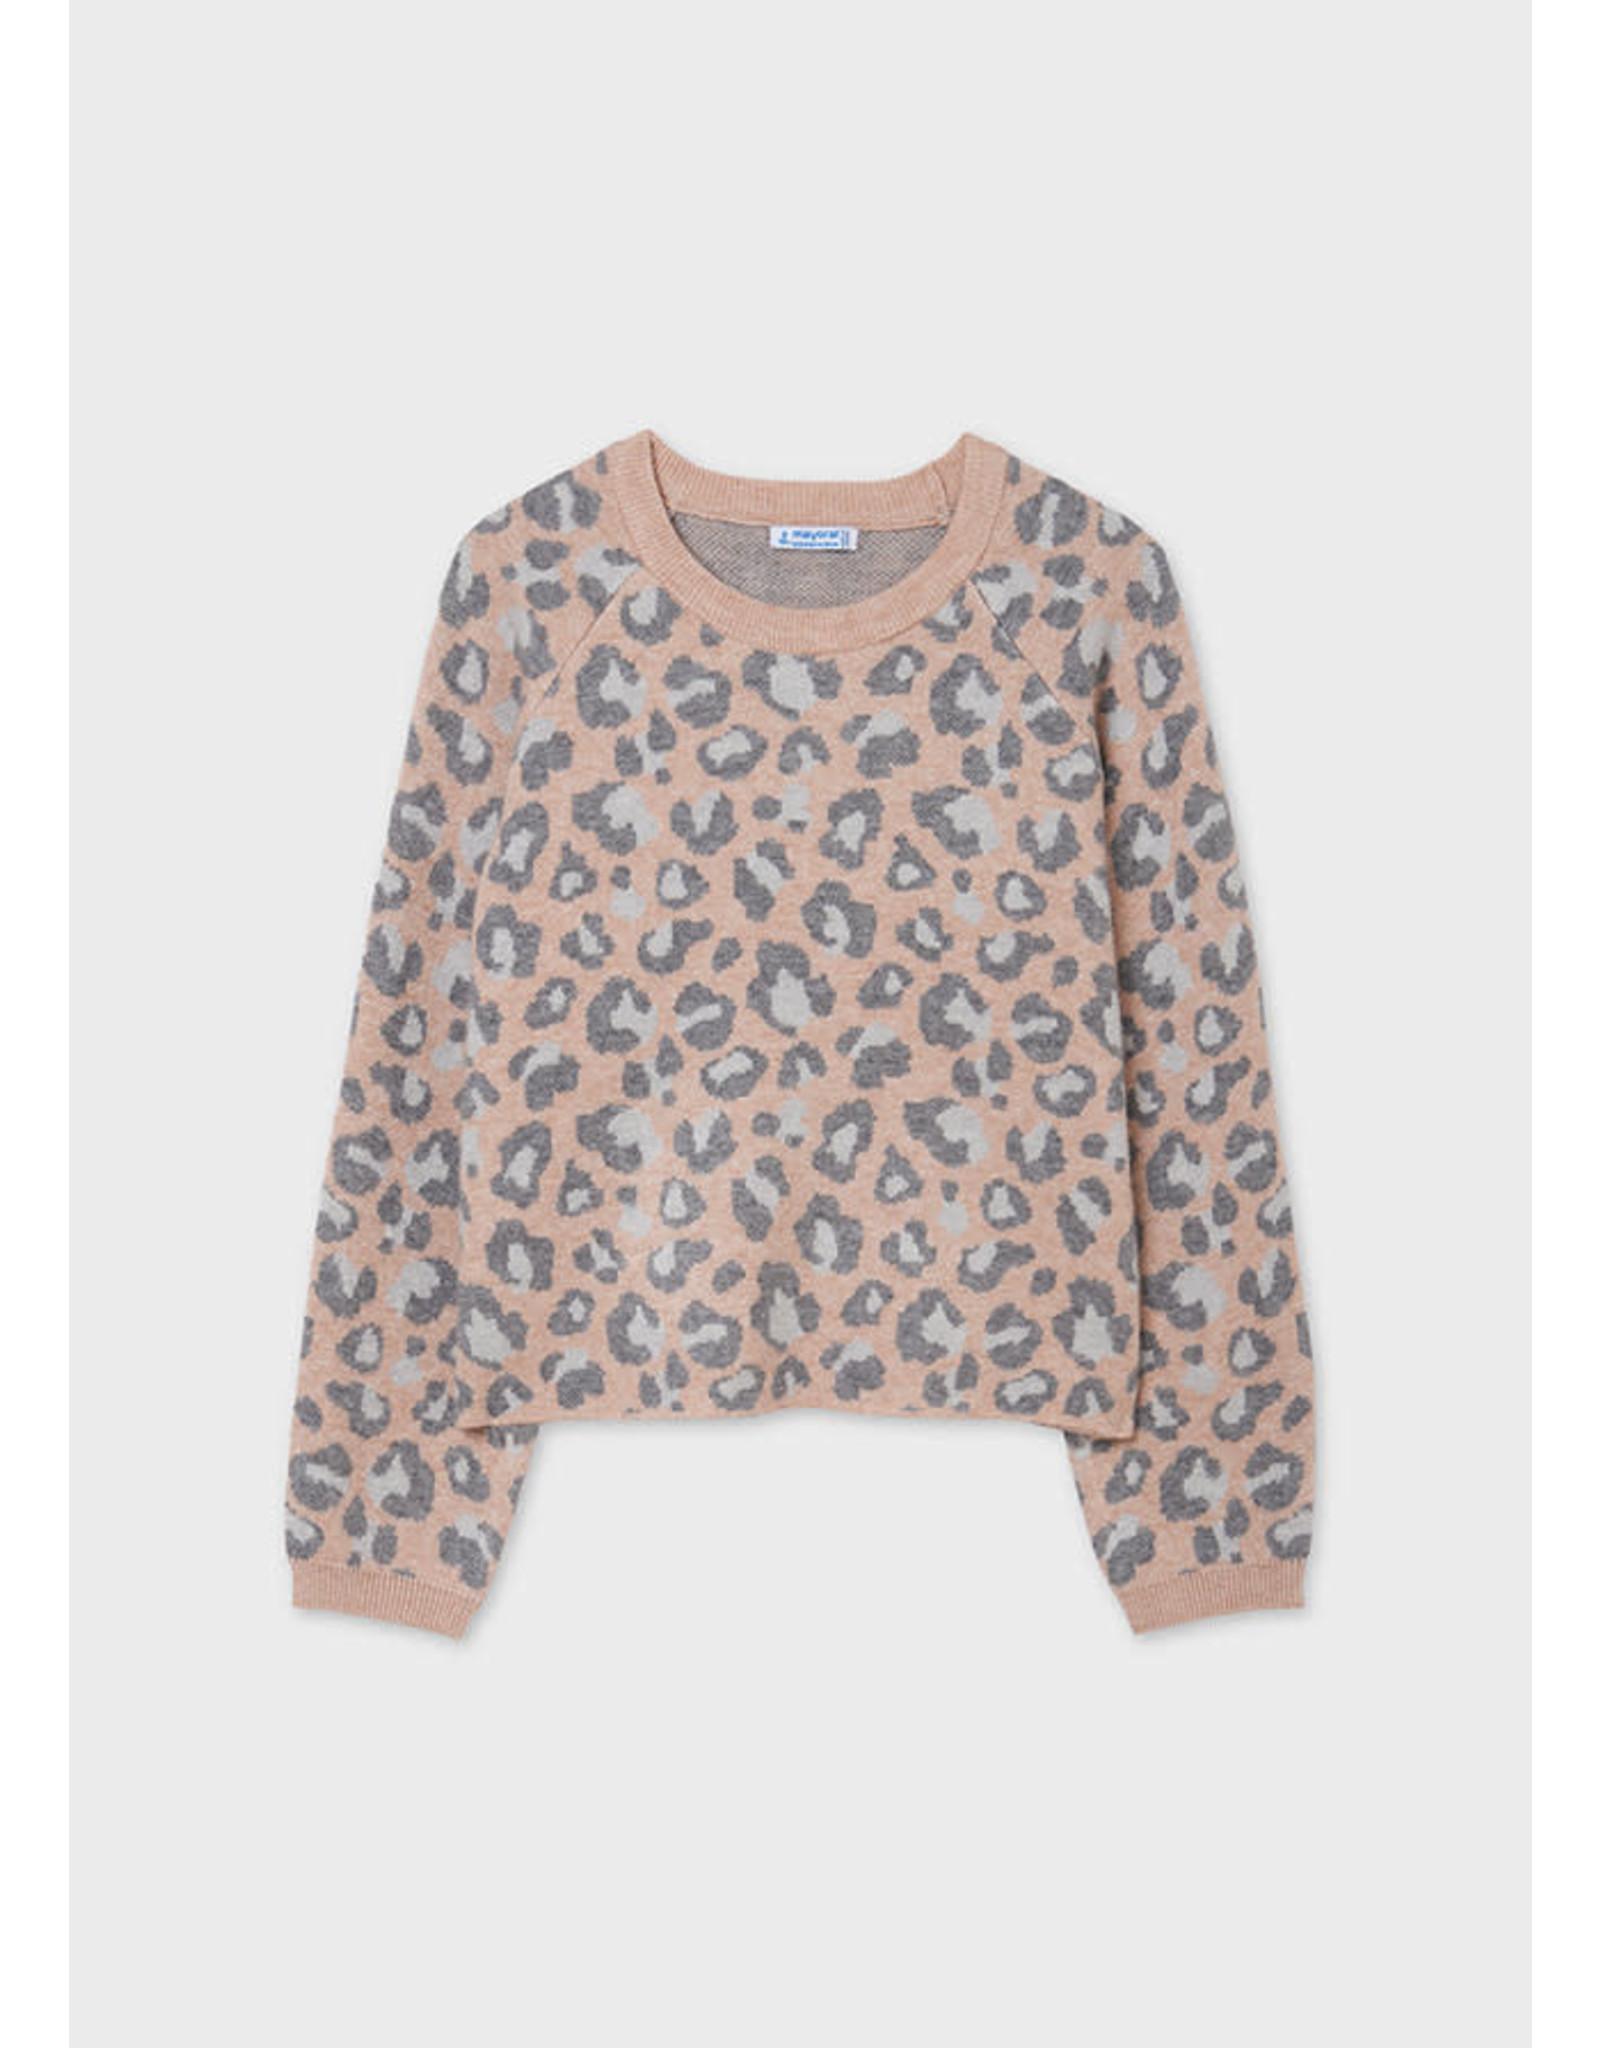 Mayoral Leopard Print Sweater - Makeup